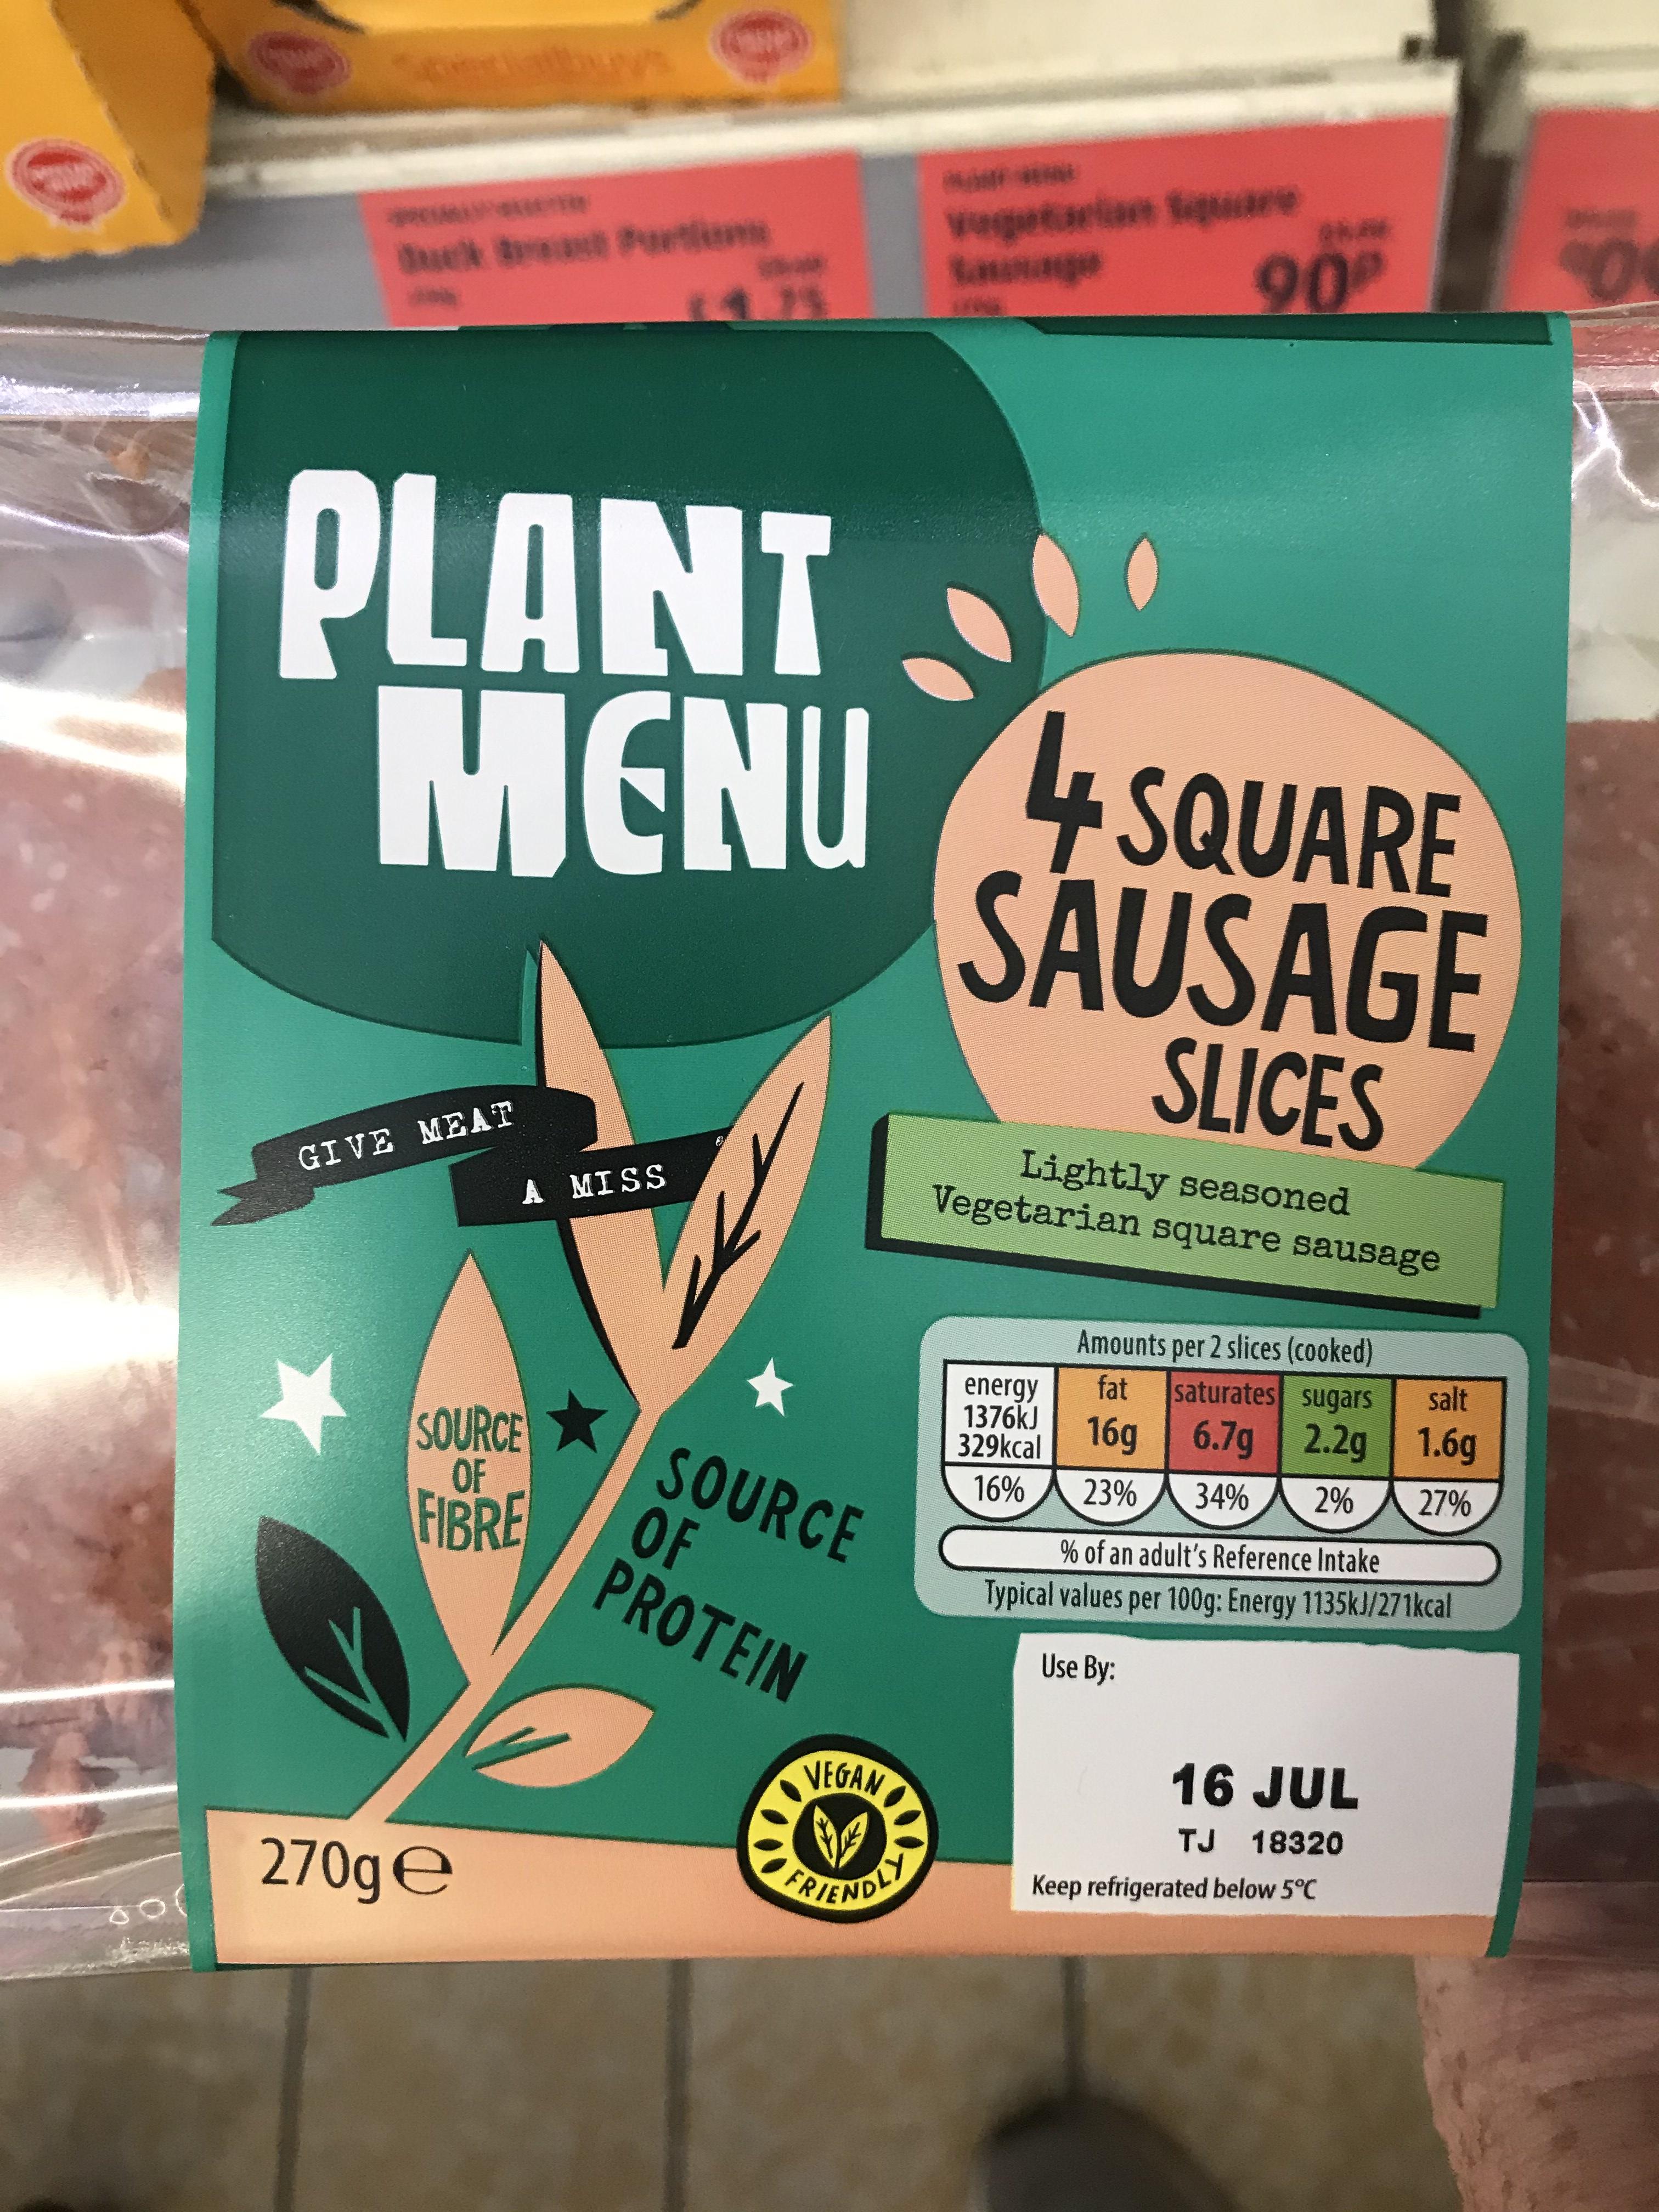 Plant Menu (4 square sausages) £0.90 instore at Aldi Cambuslang